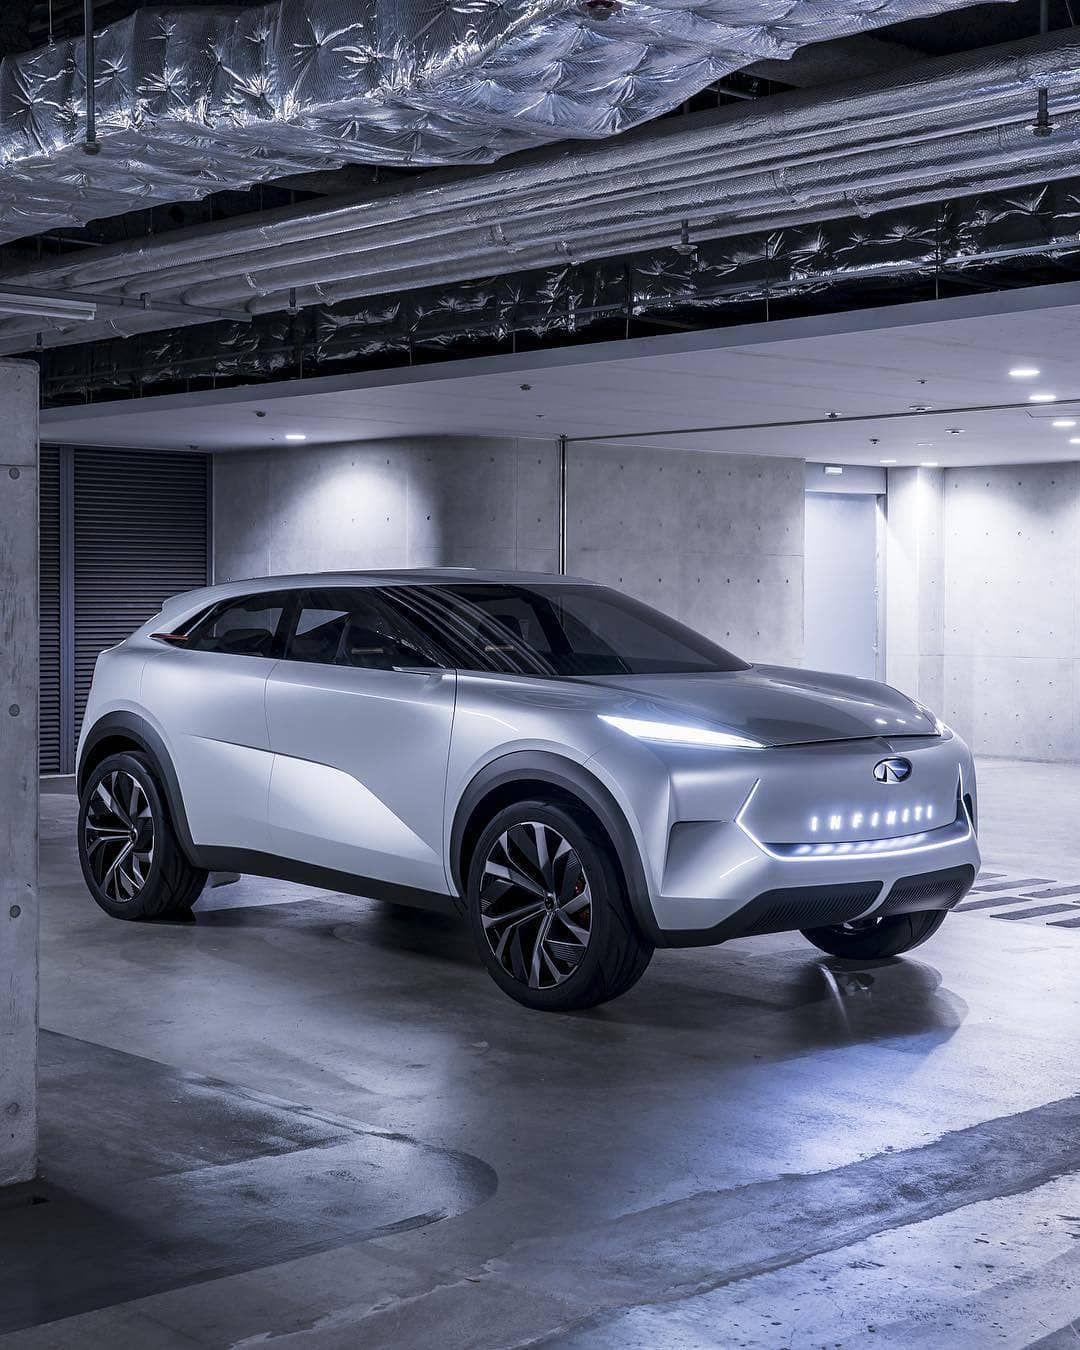 Infiniti S Qx Inspiration Concept Infinitiqxinspiration Infiniti Cardedign Concept Cars Infiniti Future Concept Cars